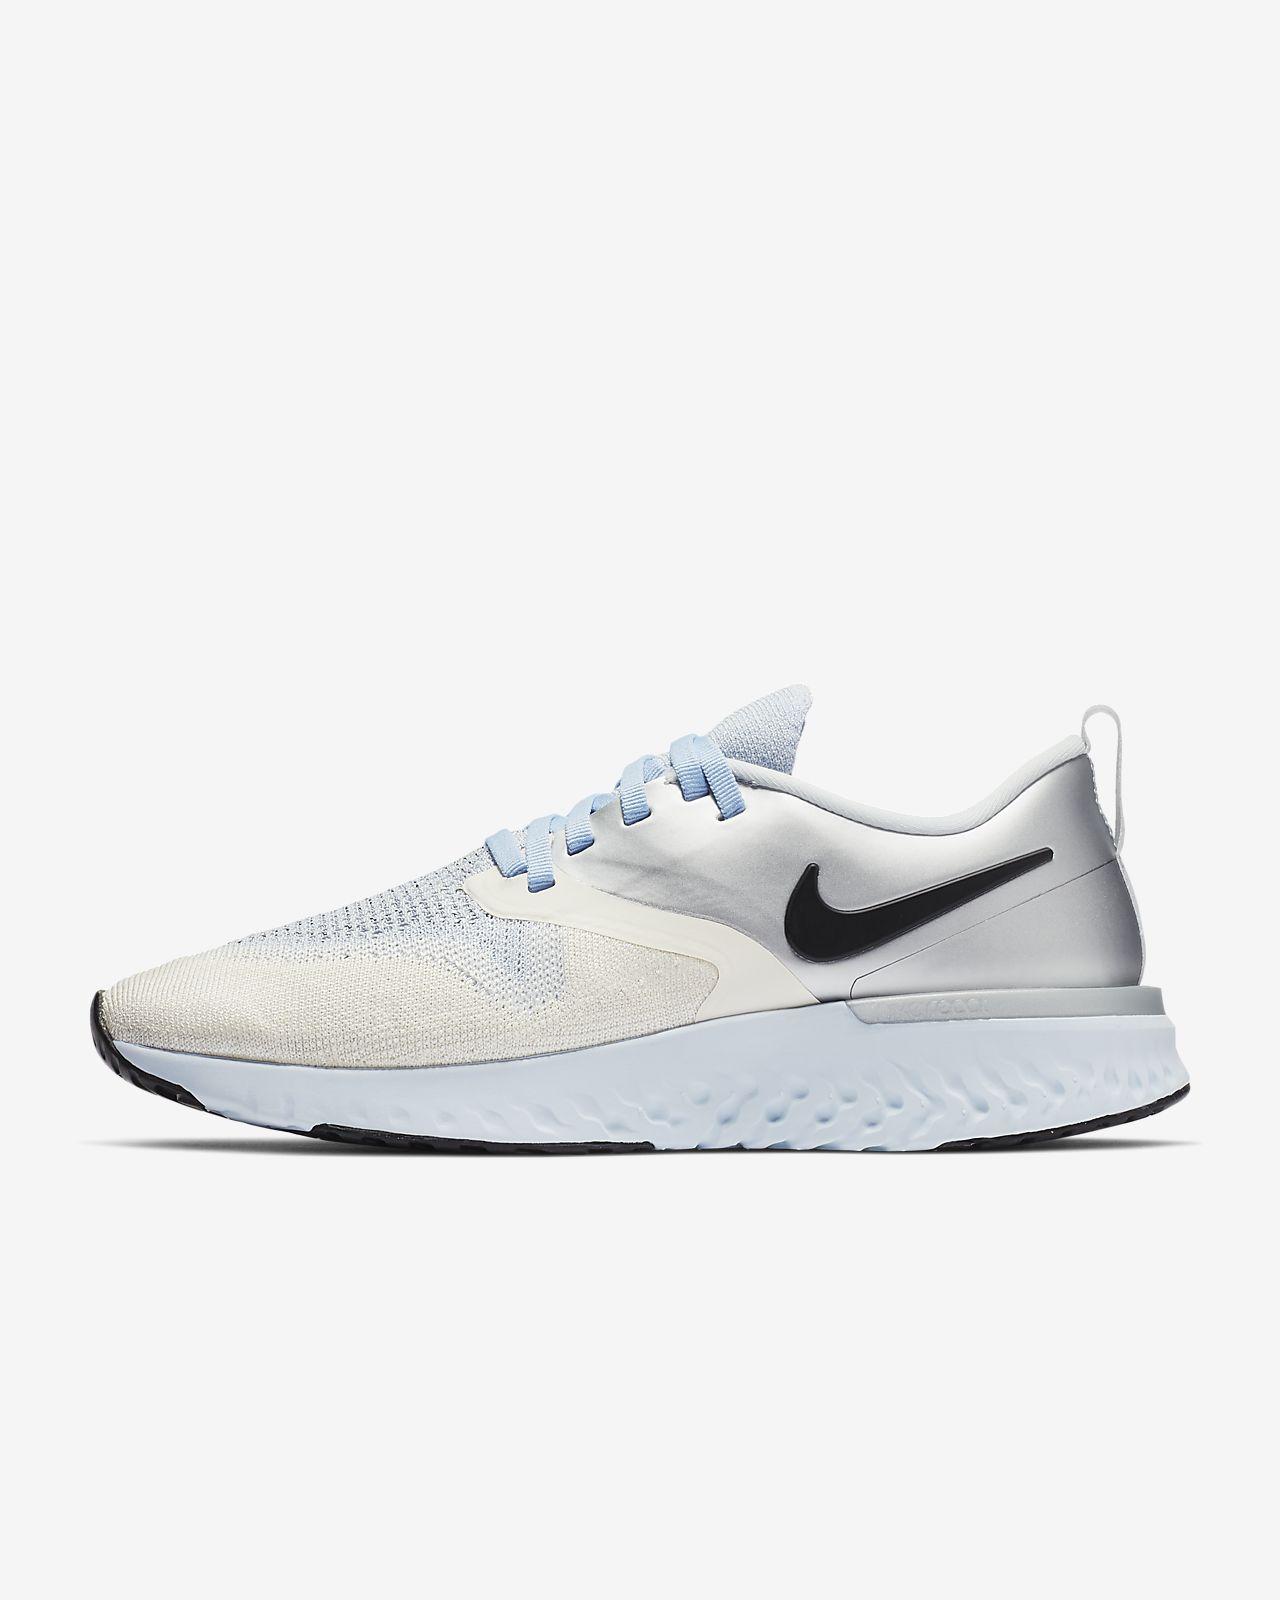 Nike Odyssey React Flyknit 2 Premium Damen Laufschuh